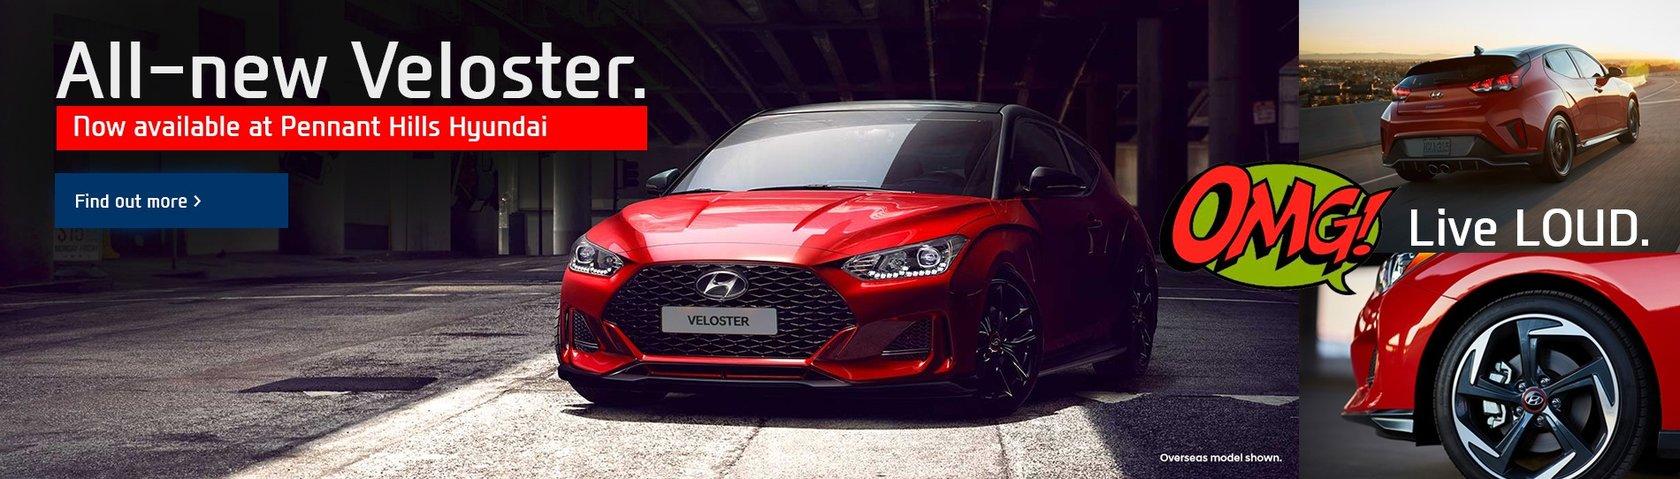 Pennant Hills Hyundai - All-New Veloster